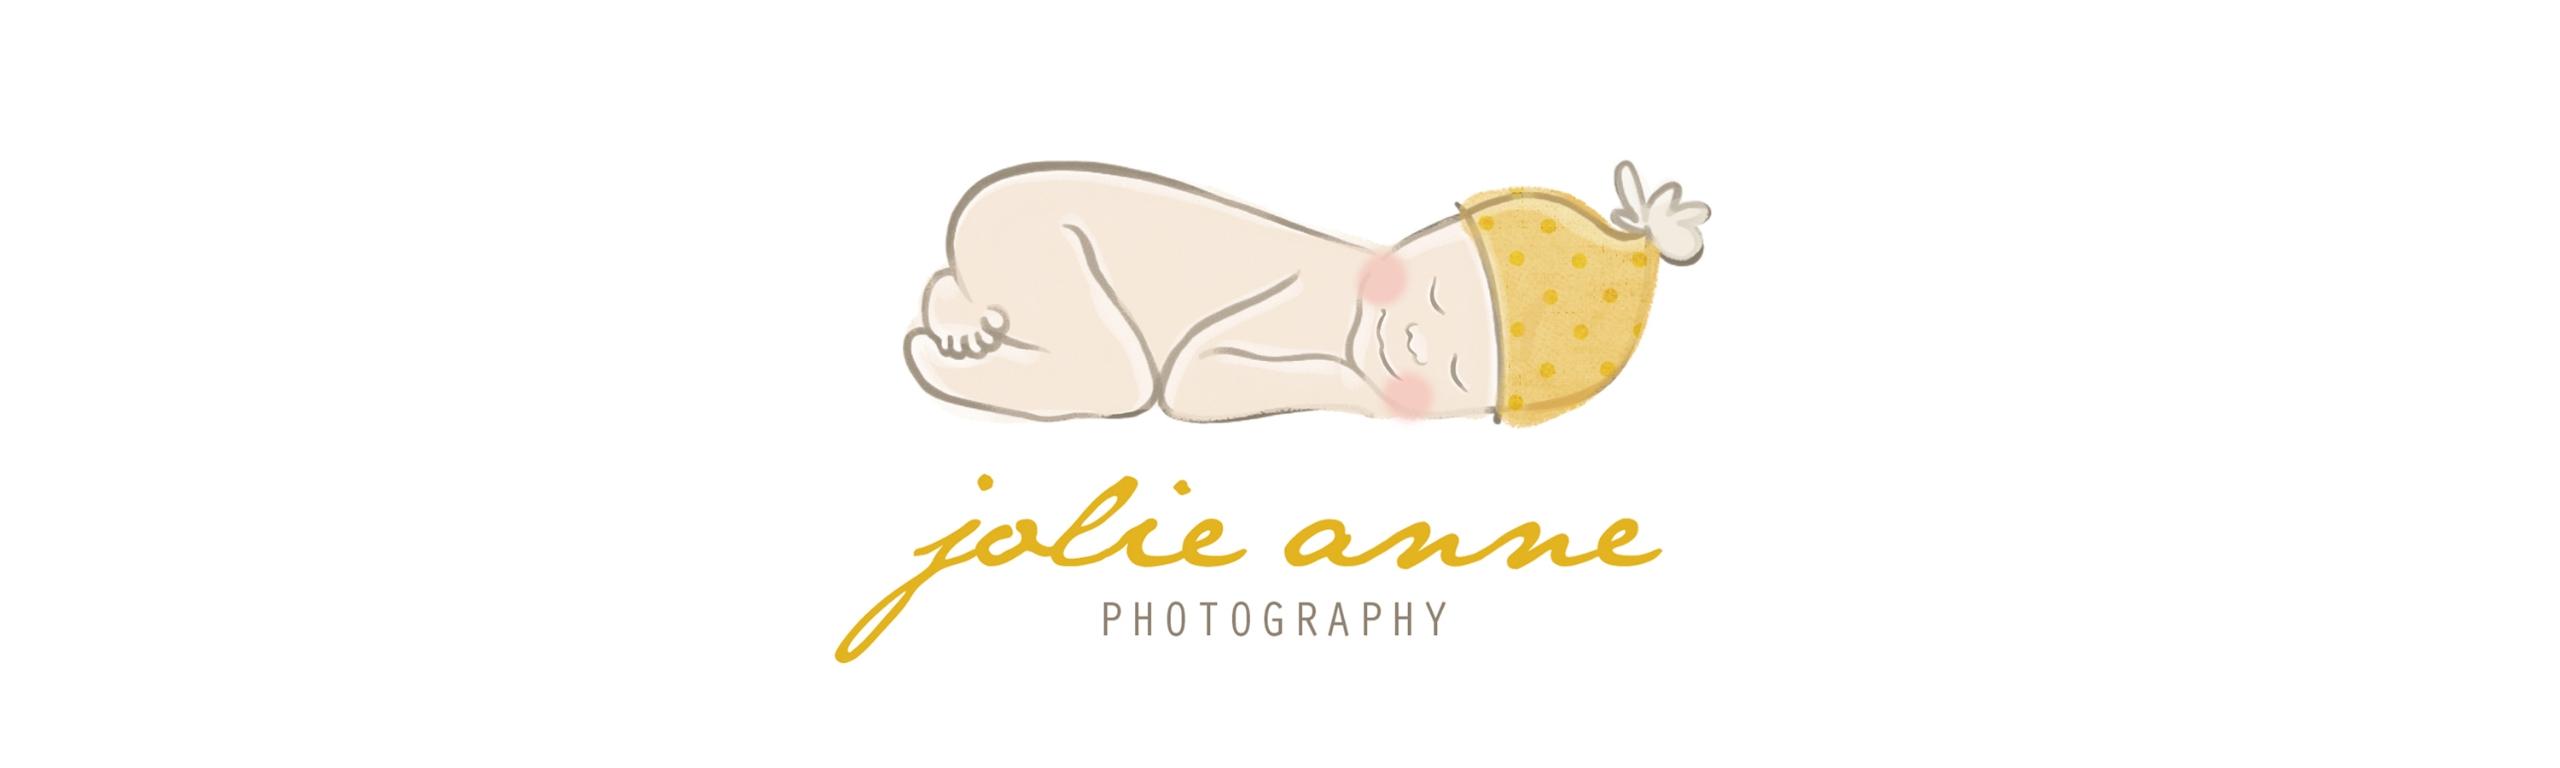 Jolie Molino (@jolieannephoto) Cover Image